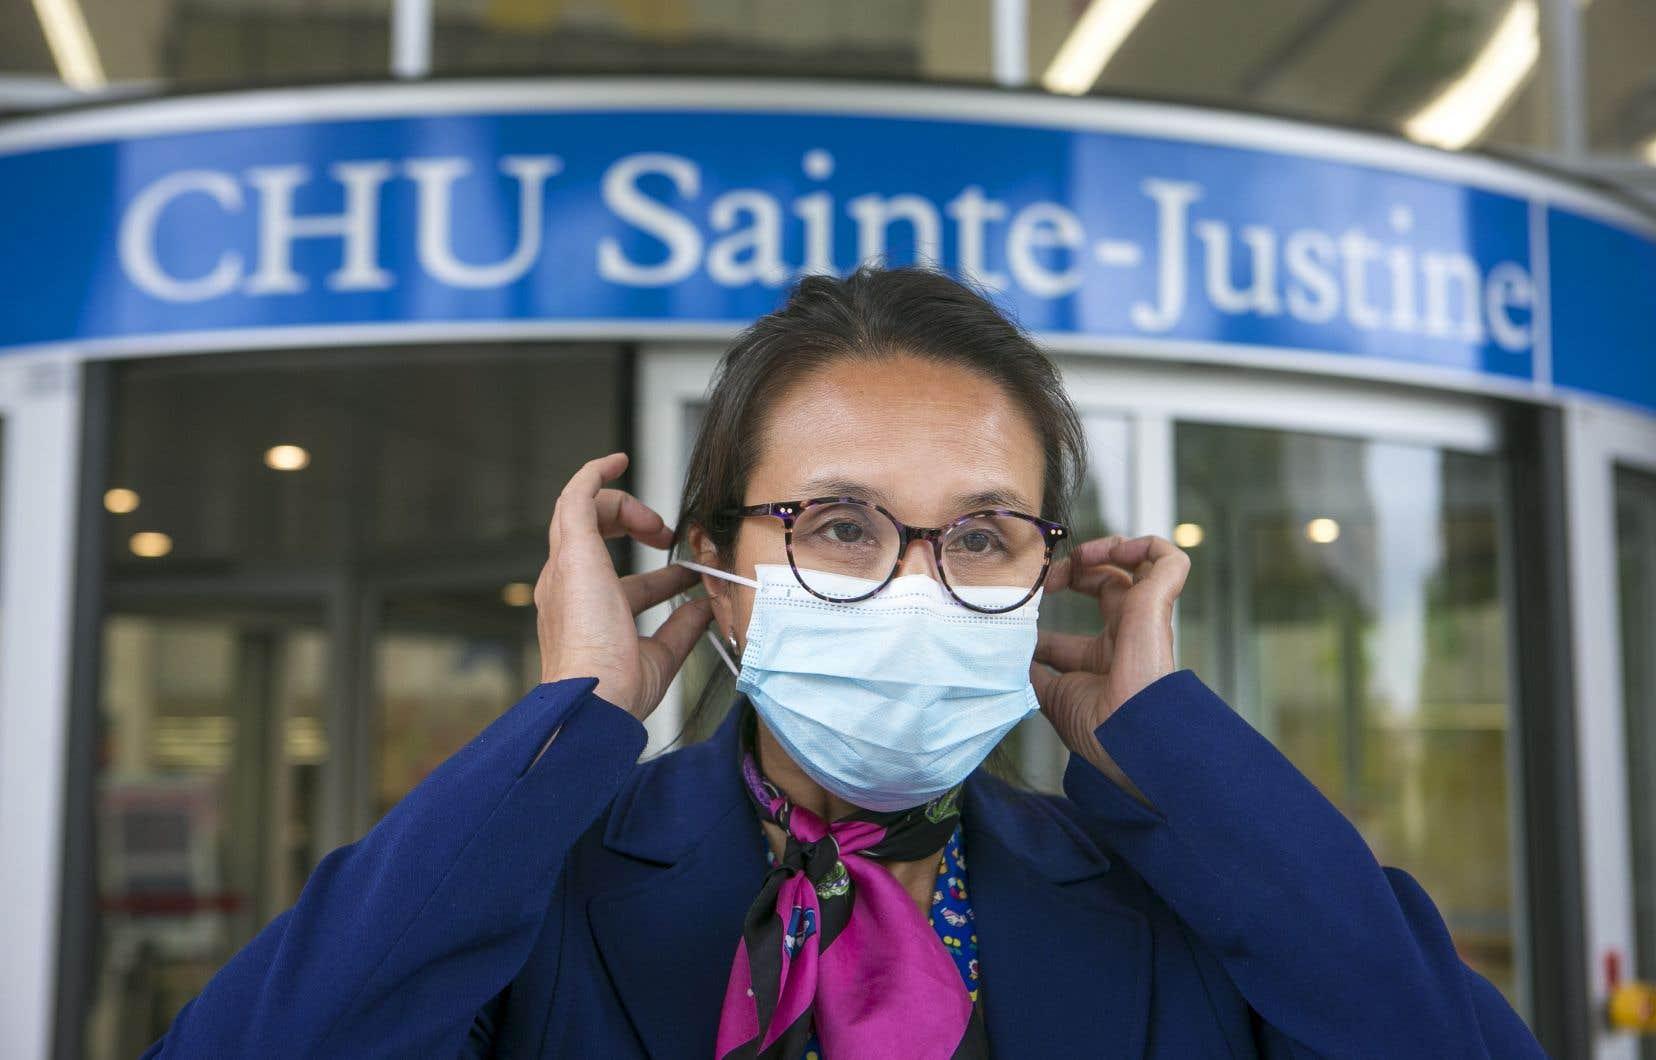 La Dre Caroline Quach-Thanh, microbiologiste-infectiologue au CHU Sainte-Justine